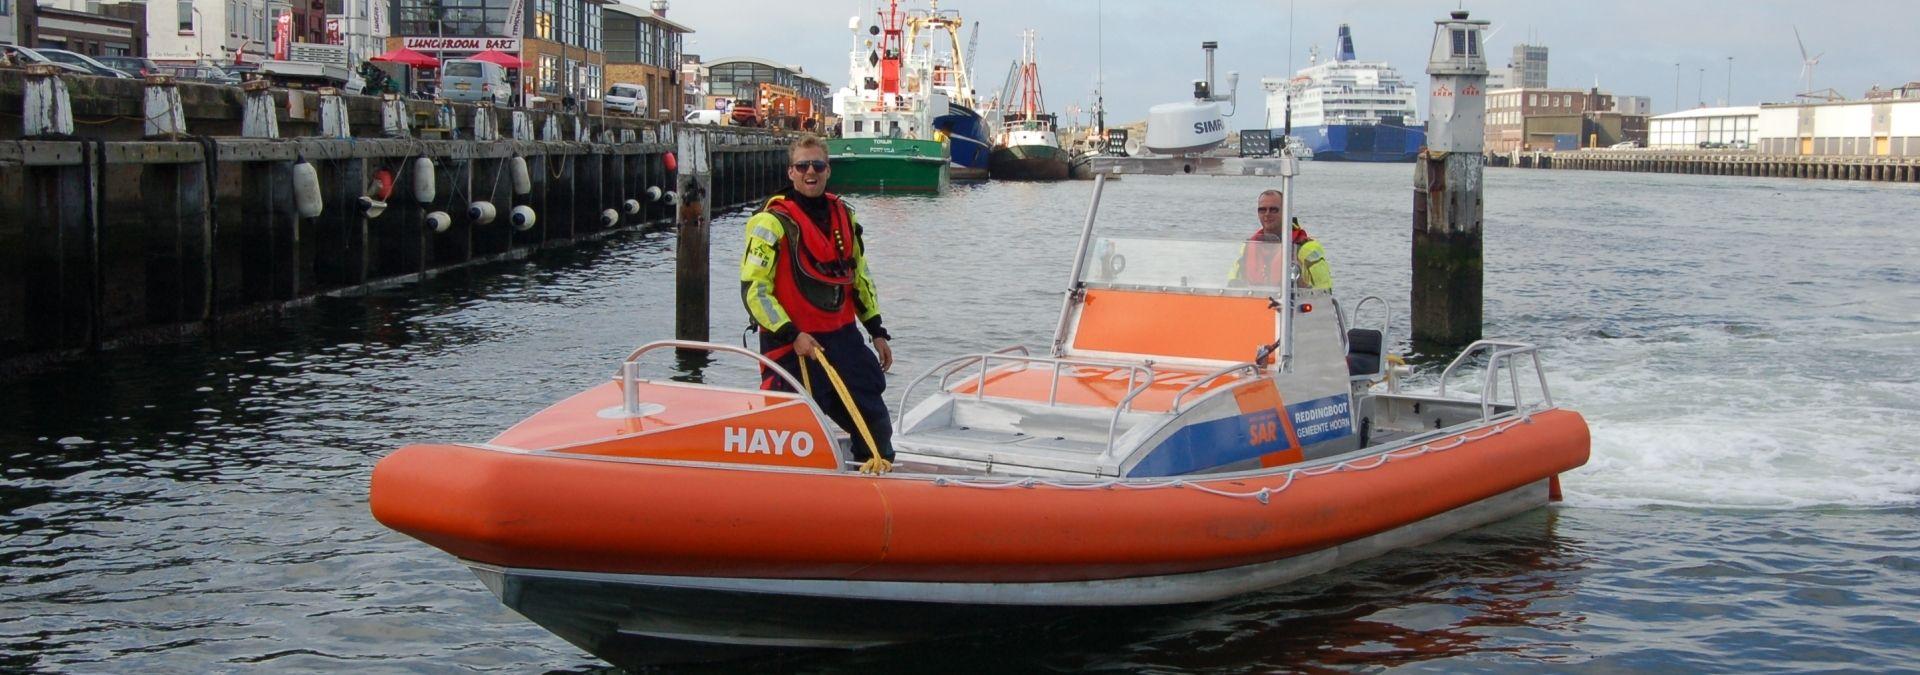 Reddingboot Hayo